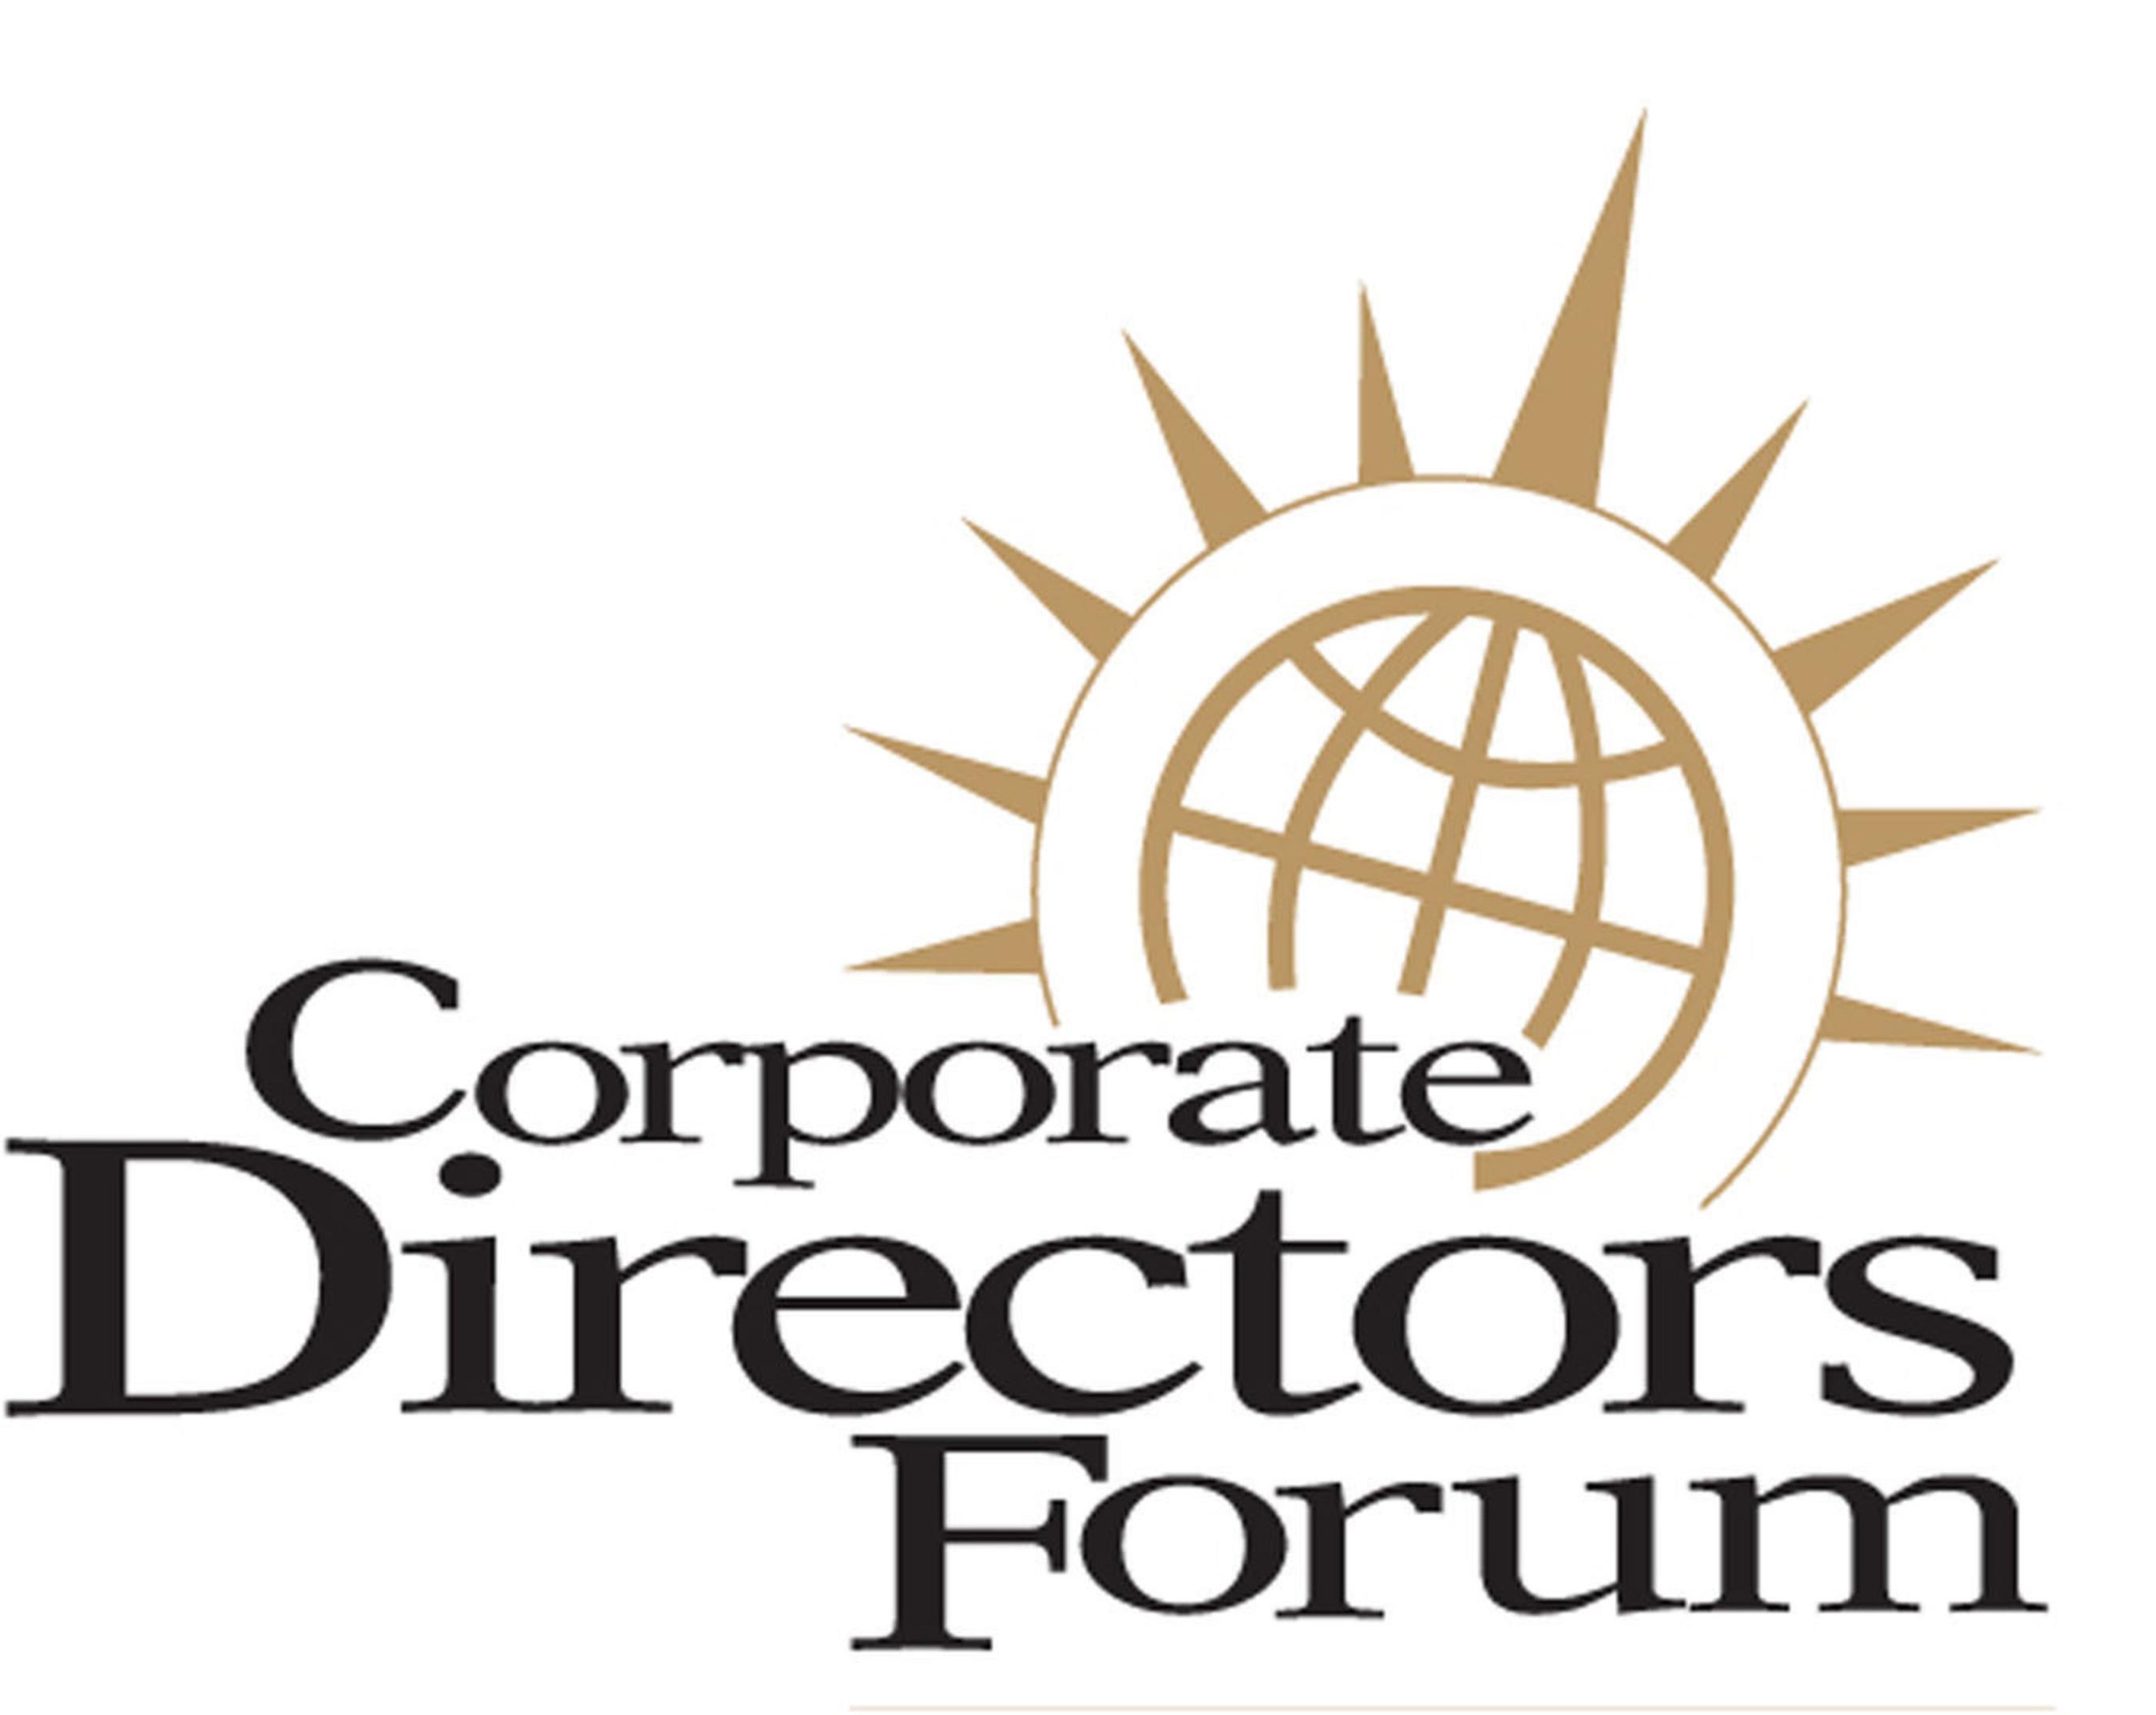 Corporate Directors Forum logo.